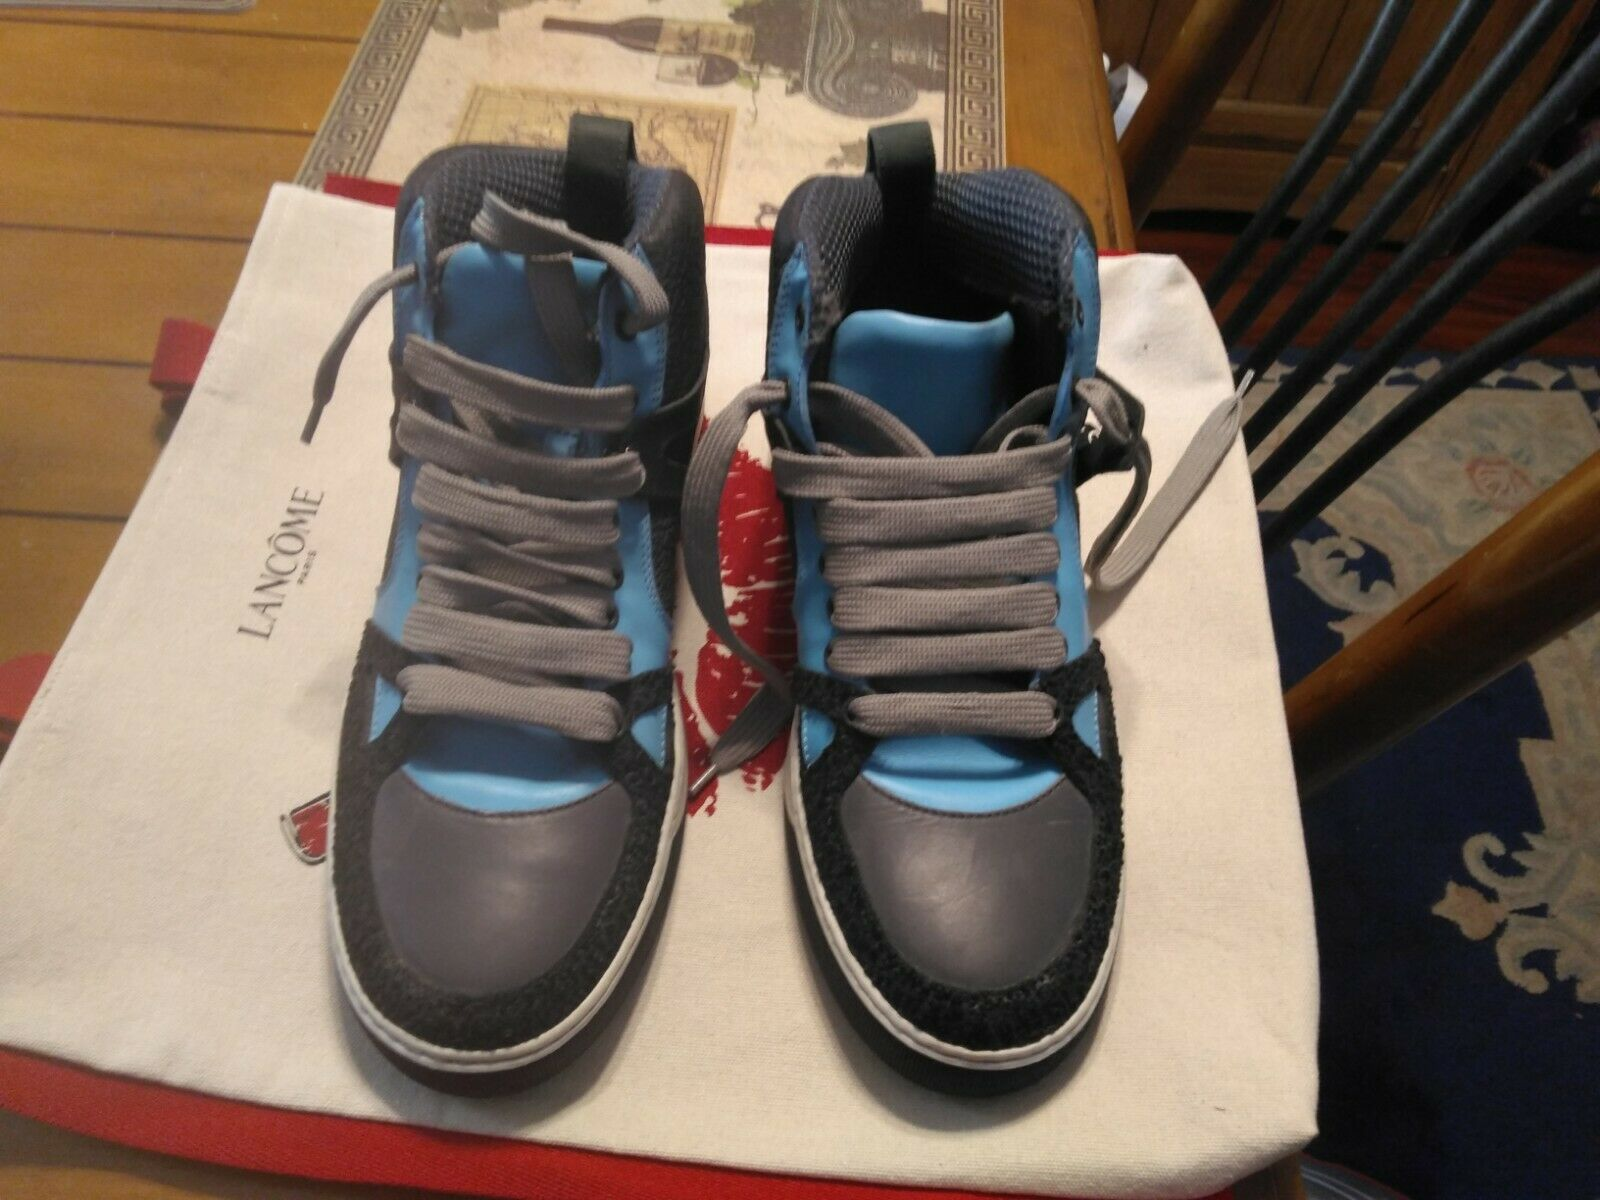 Fashion Mens shoes LANVIN SIZE 10 NORDSTROM ITEM PRICE 1K BRAND NEW